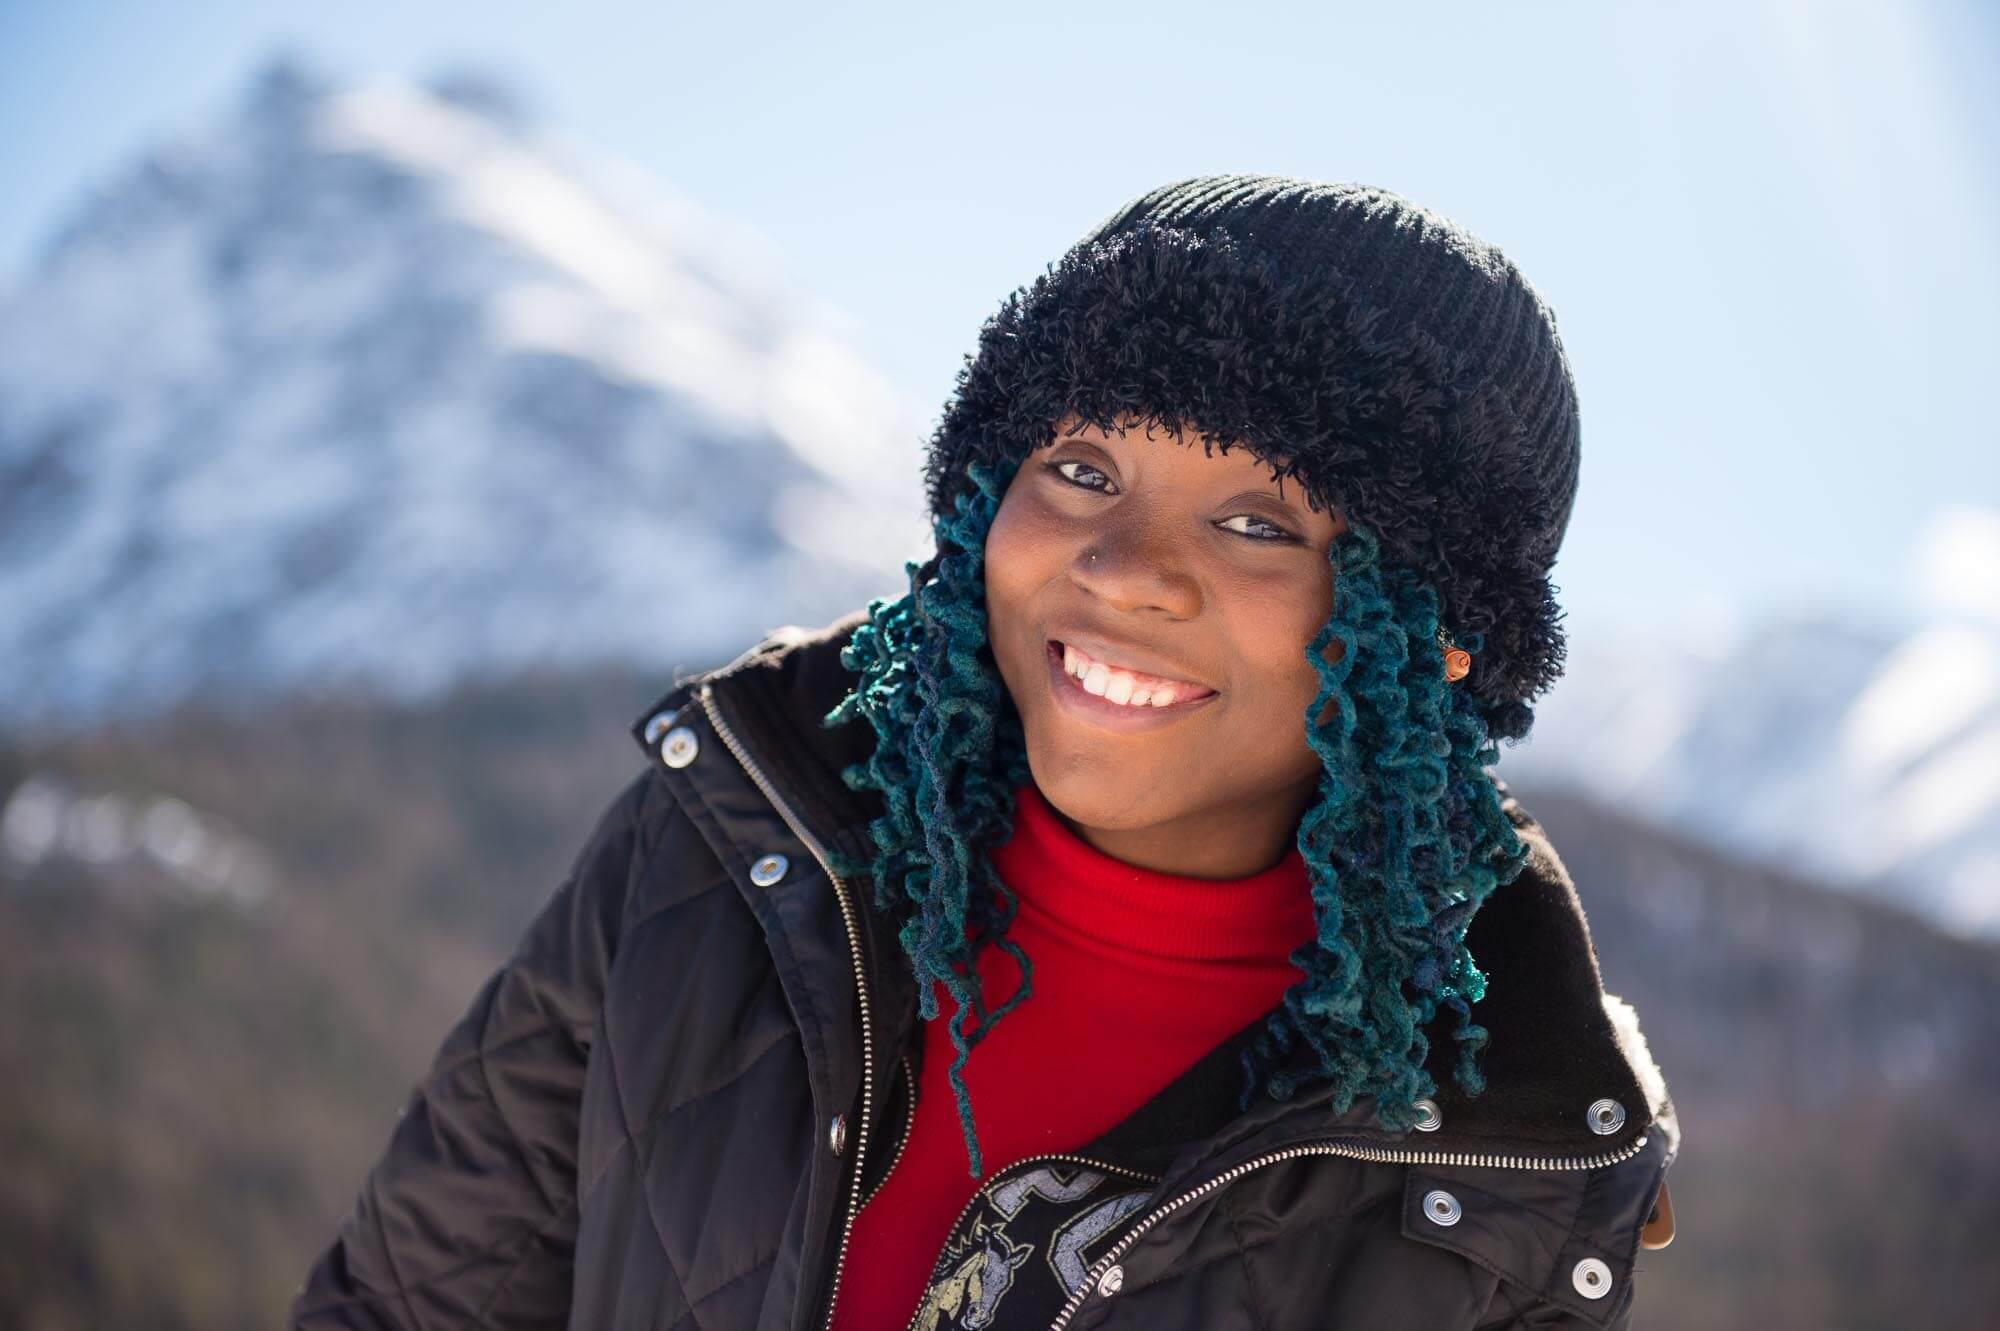 Portrait of girl in alps